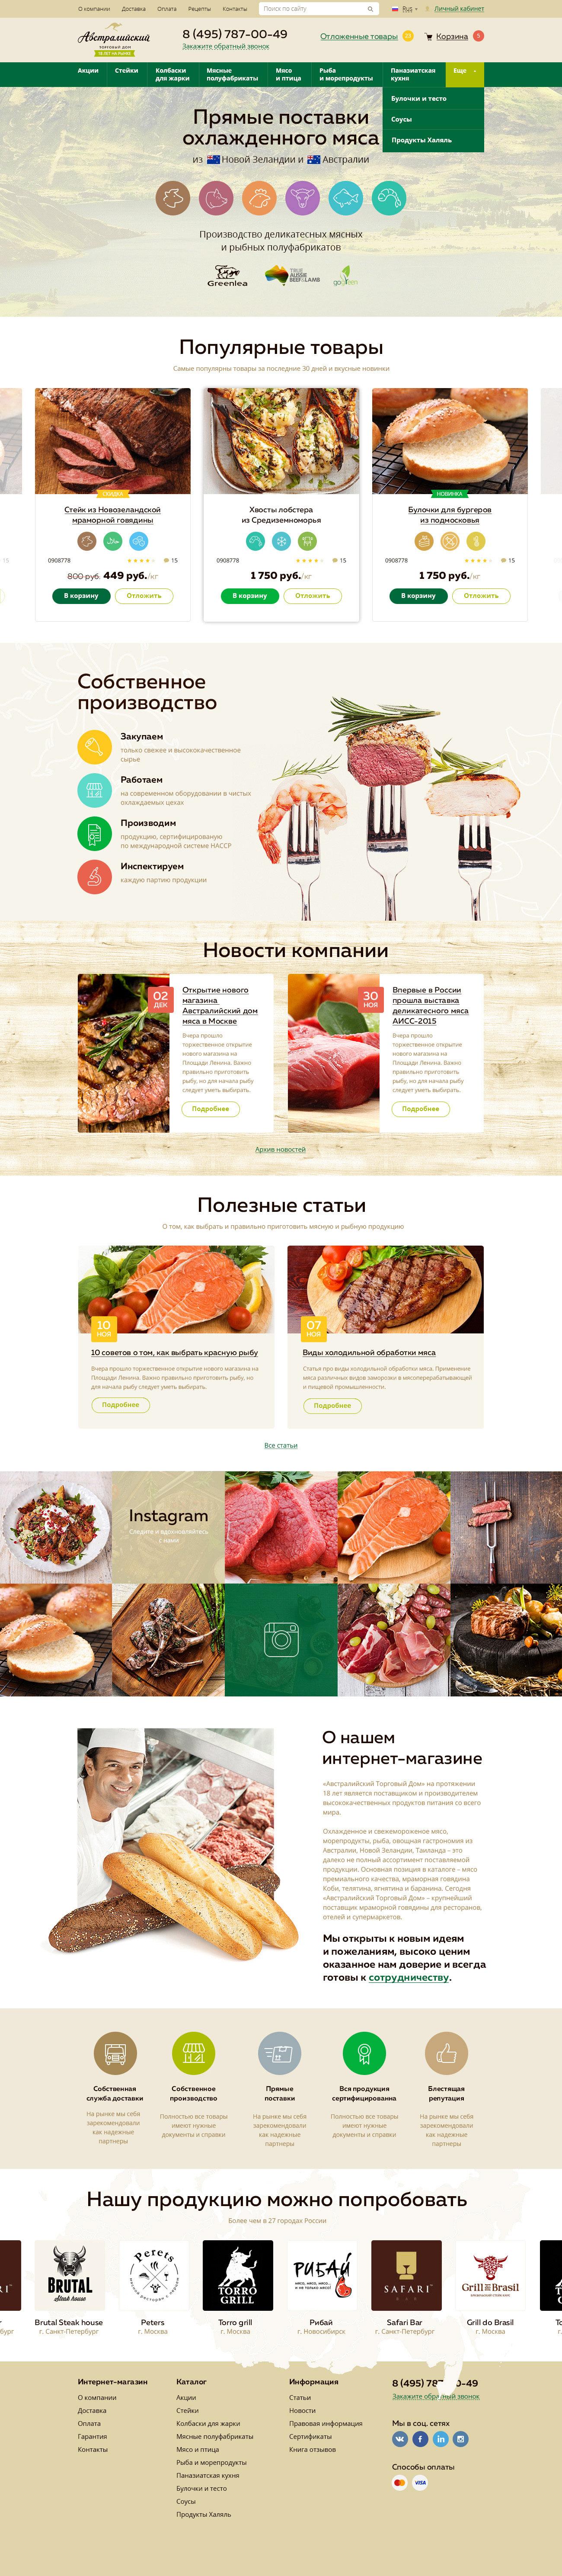 Разработка дизайна сайта lovepirogova.ru фото f_59156b1a7e8b6631.jpg